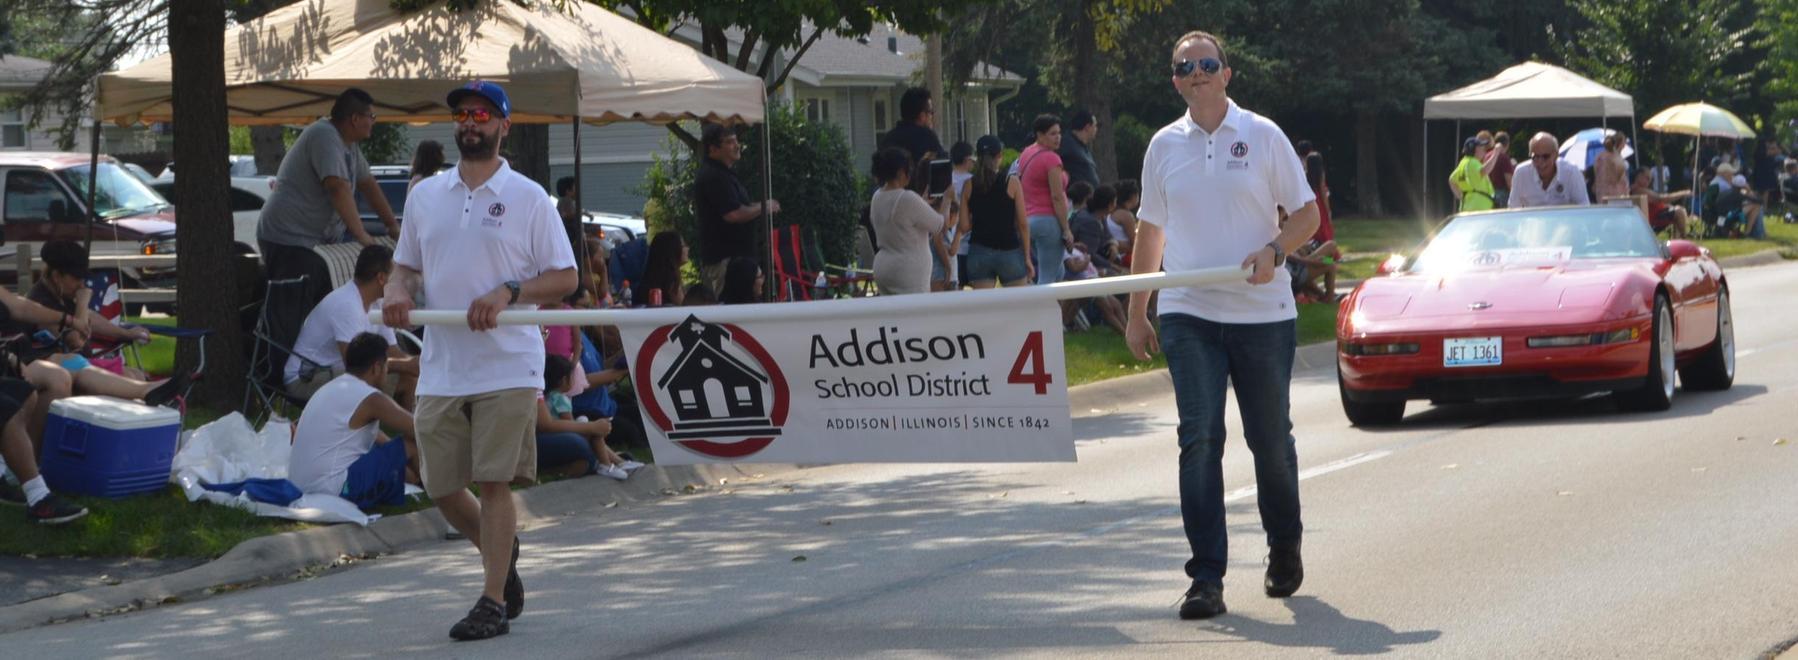 Board of Ed in parade